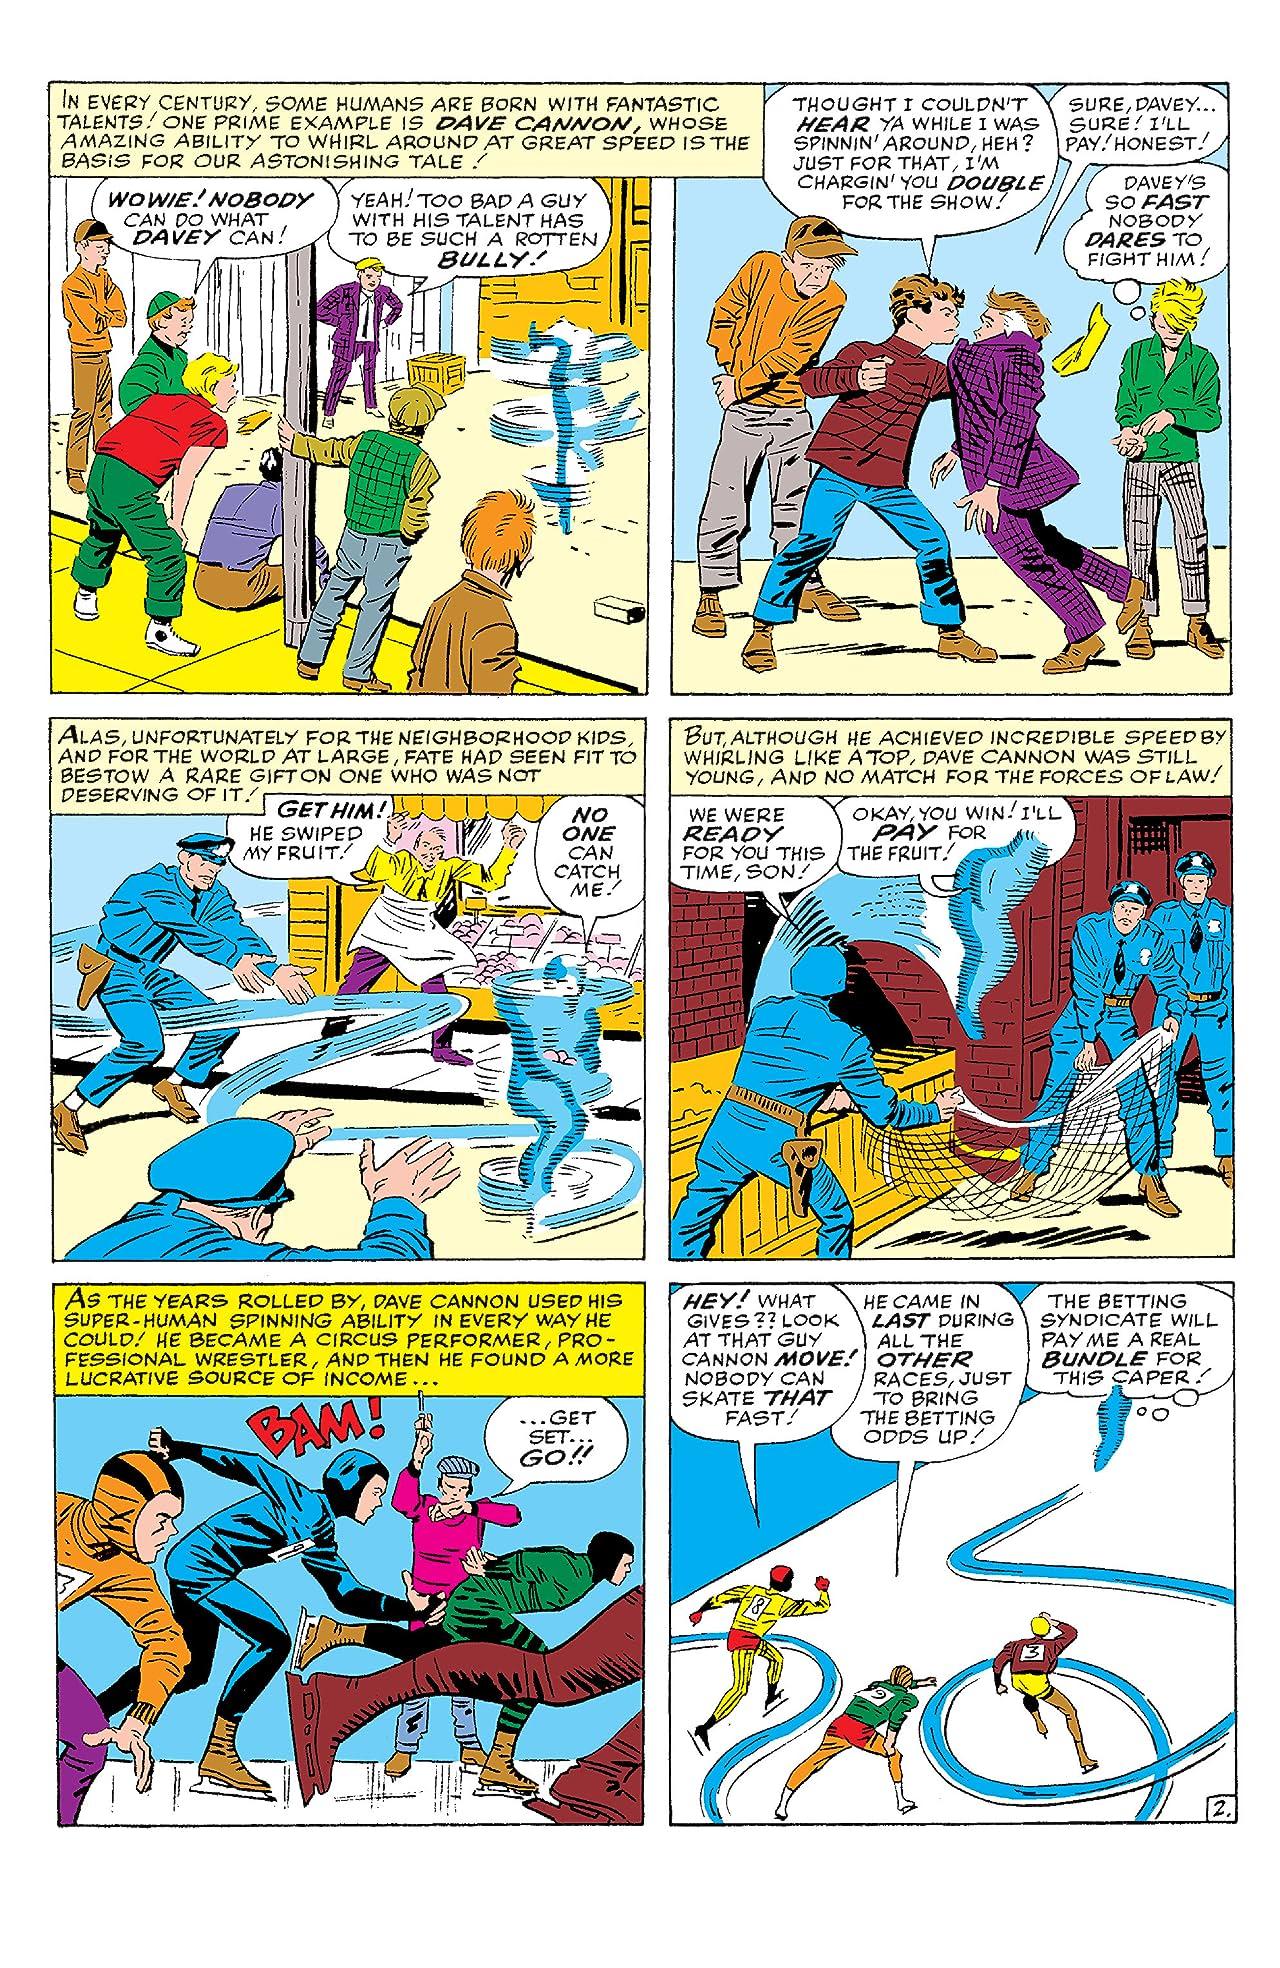 Ant-Man (1959-1968) #50